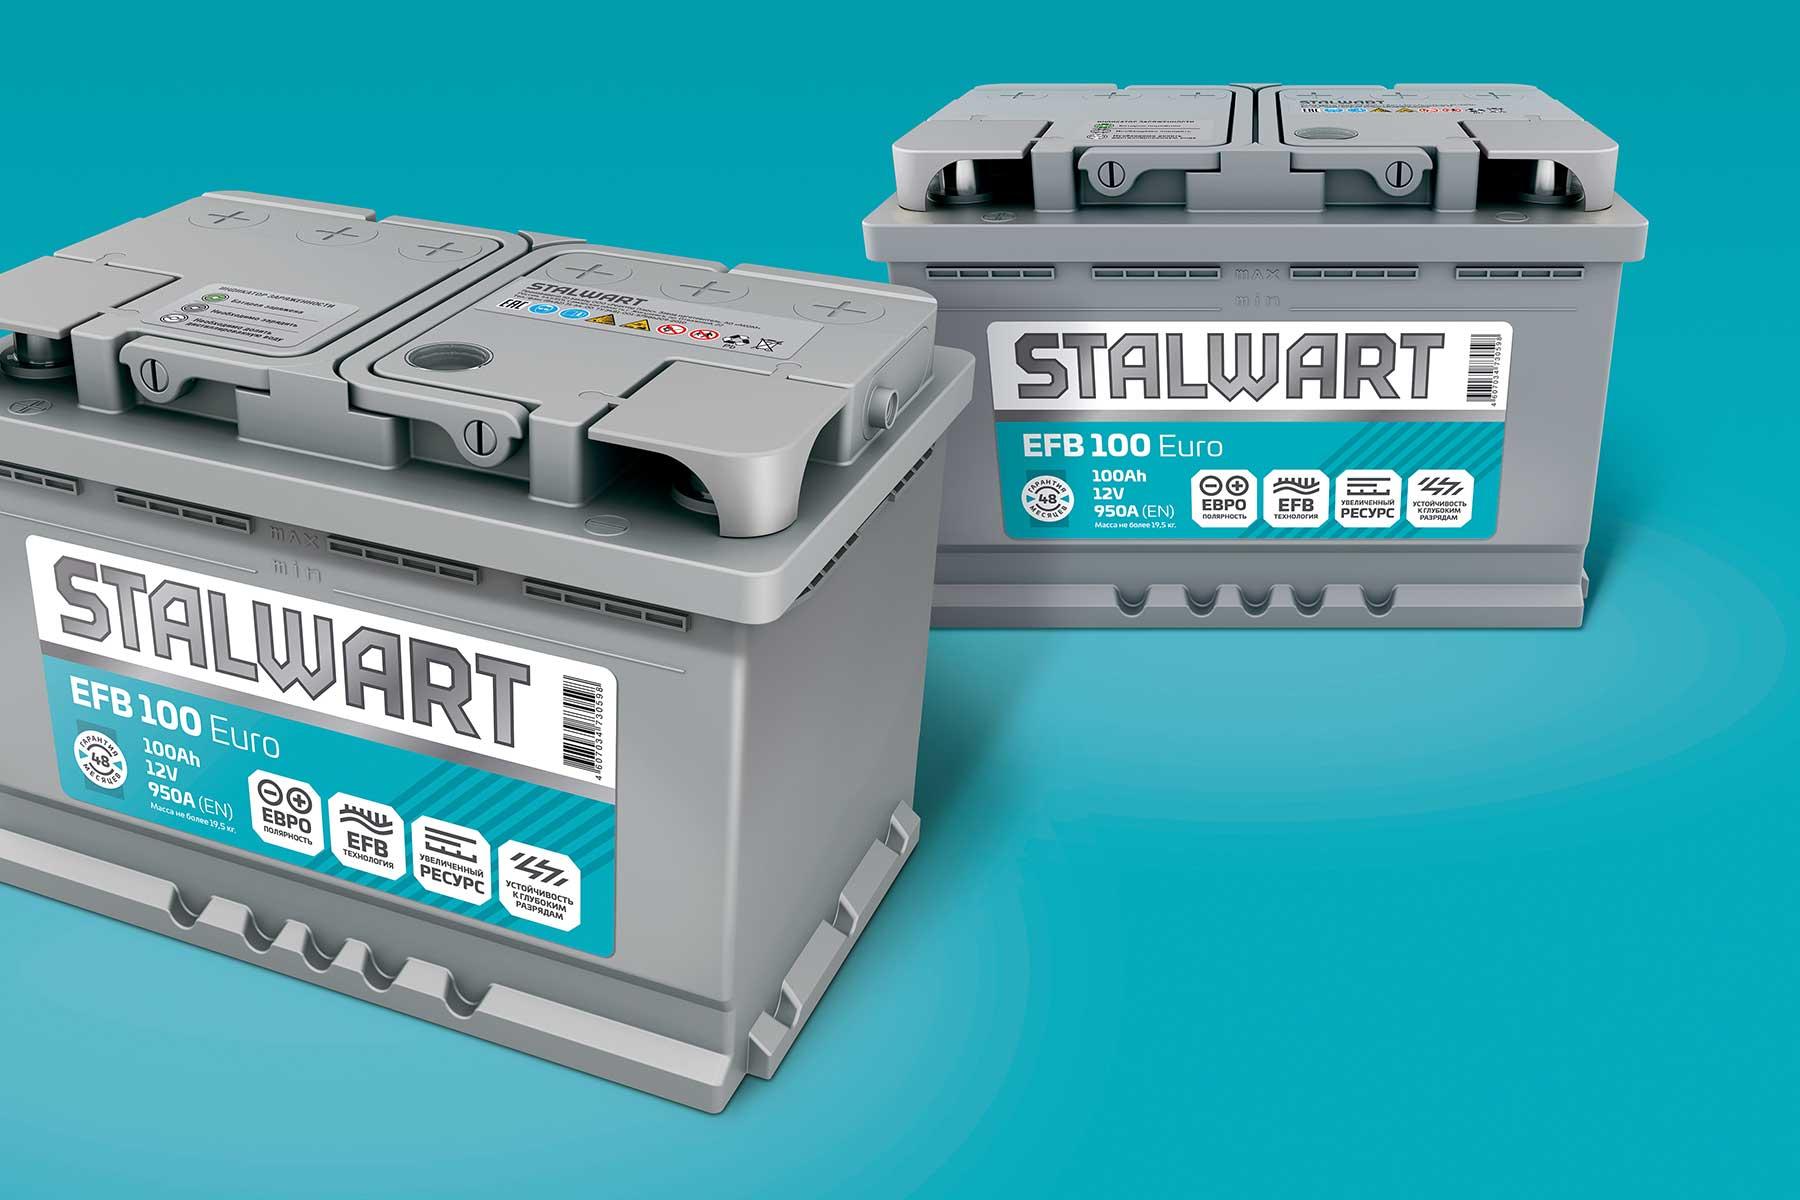 Stalwart-1-EFB-Front+Top.jpg